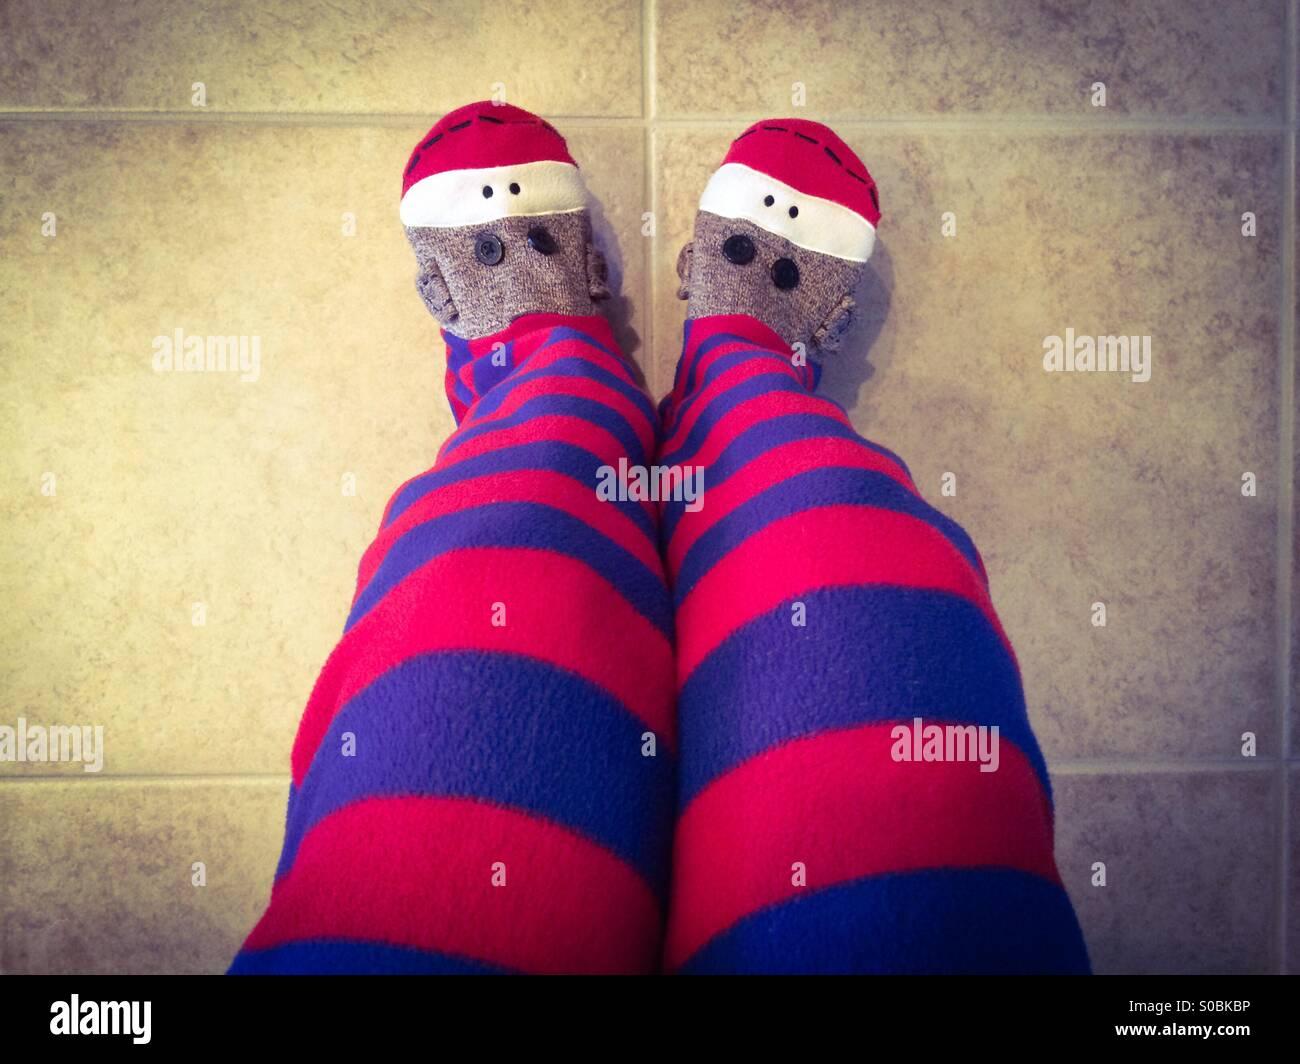 One piece adult monkey pajamas - Stock Image